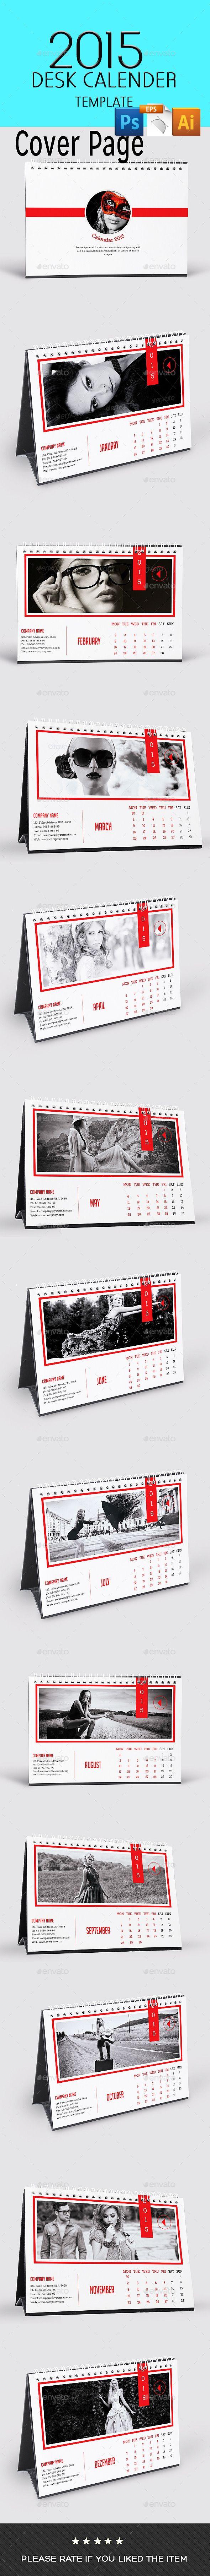 Multipurpose/Fashion Desk Calendar